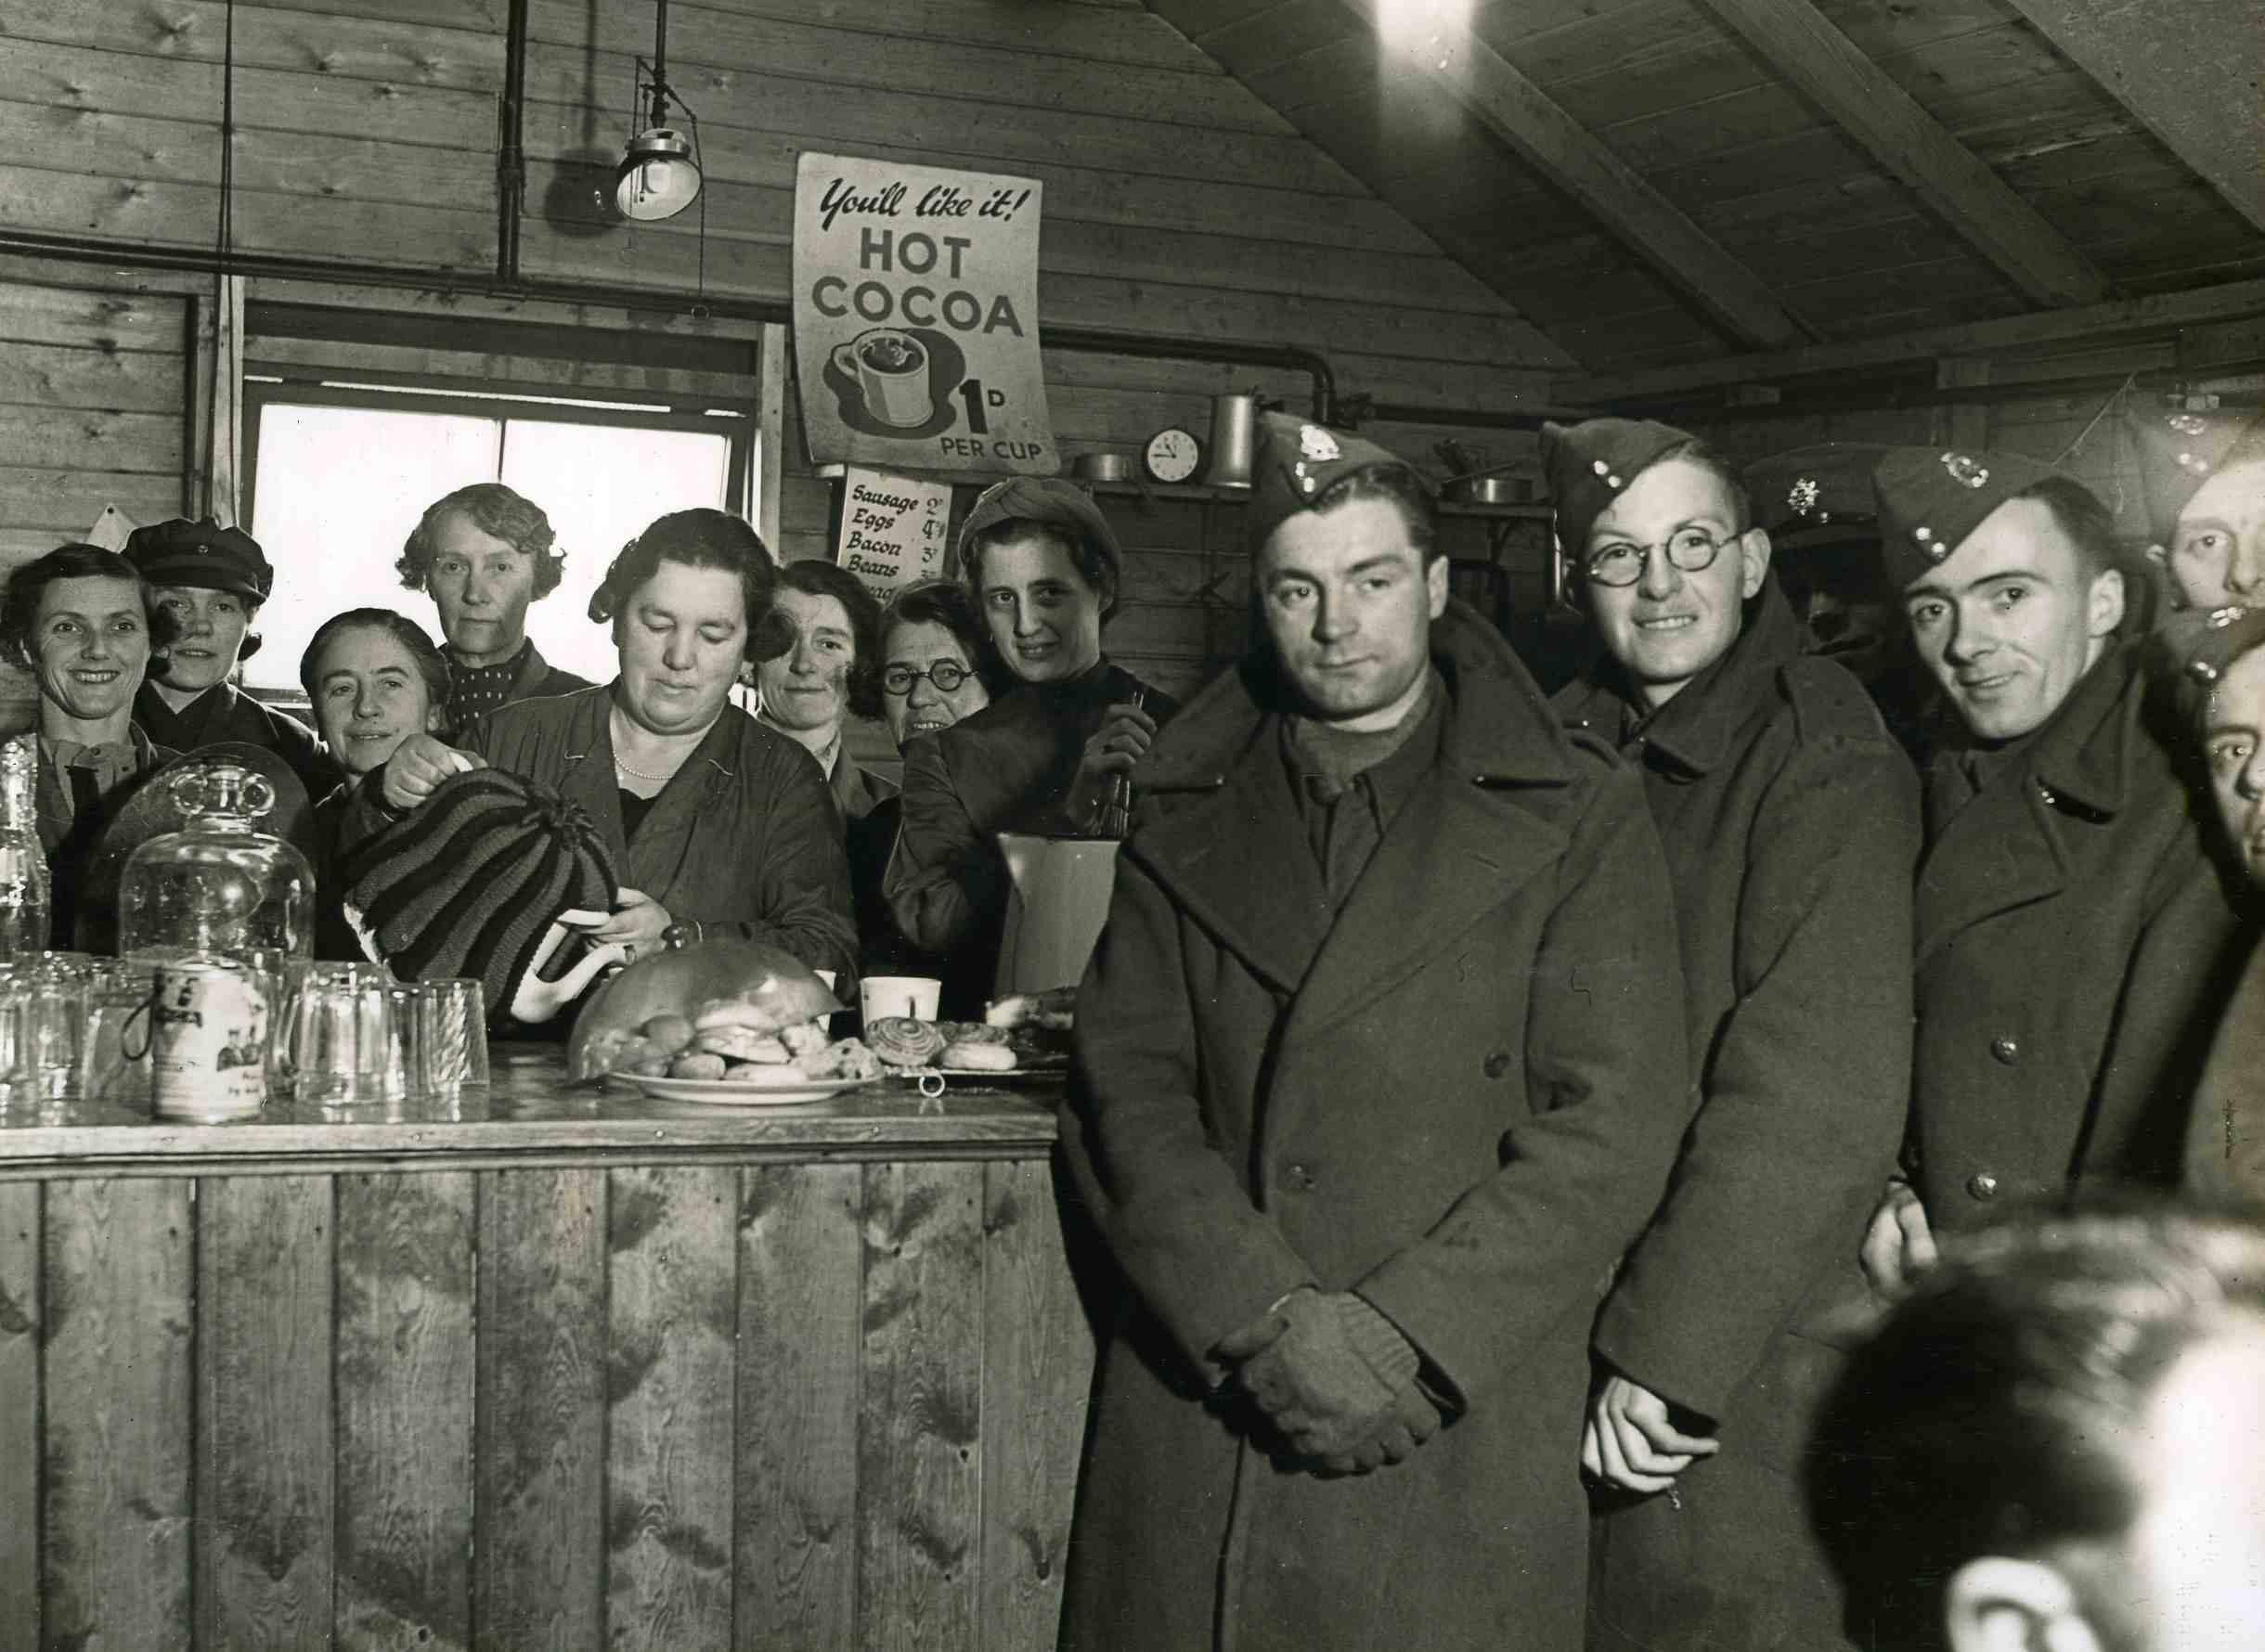 WA staff serving the troops - Barwell Camp